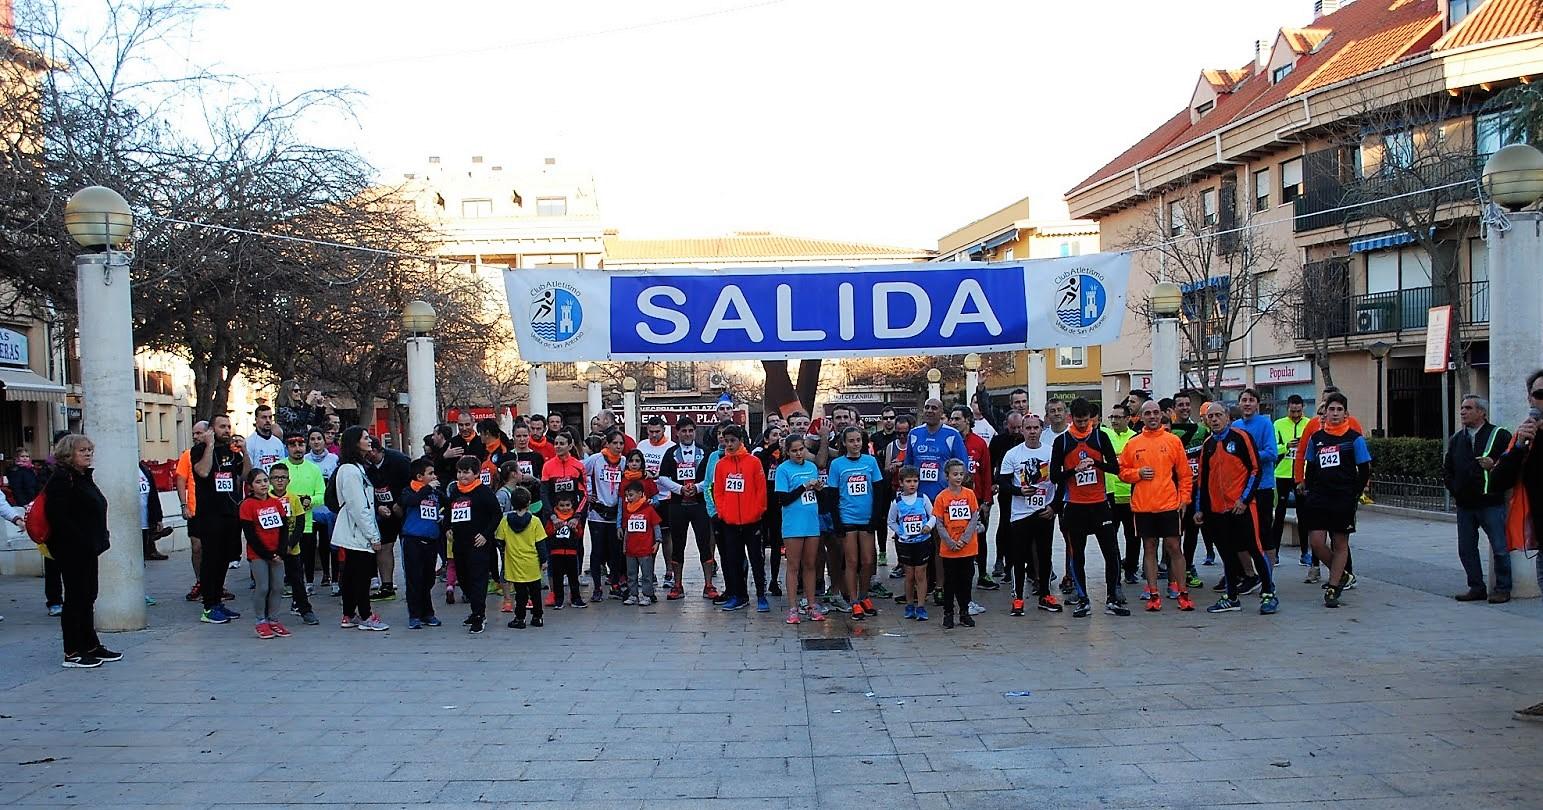 El sábado 30 de diciembre se celebró la IV San Silvestre Velillera